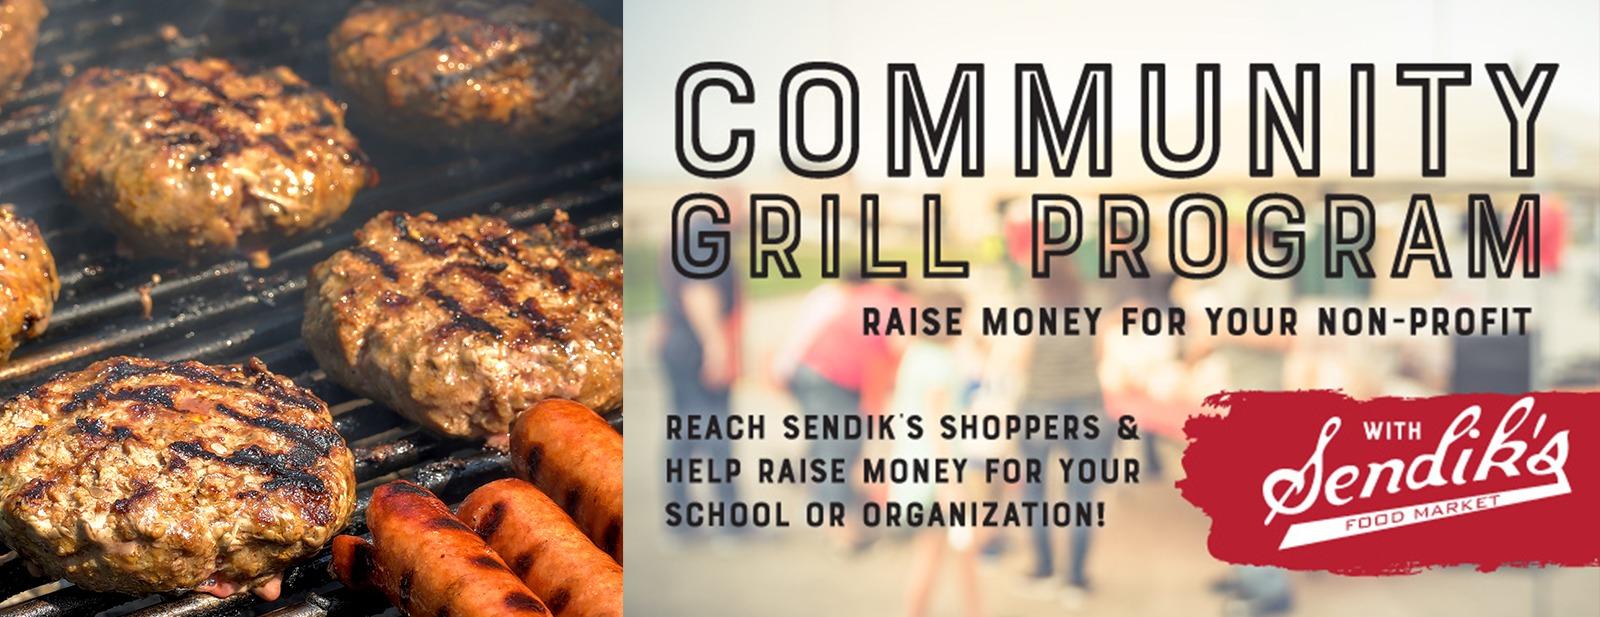 Community Grill Program